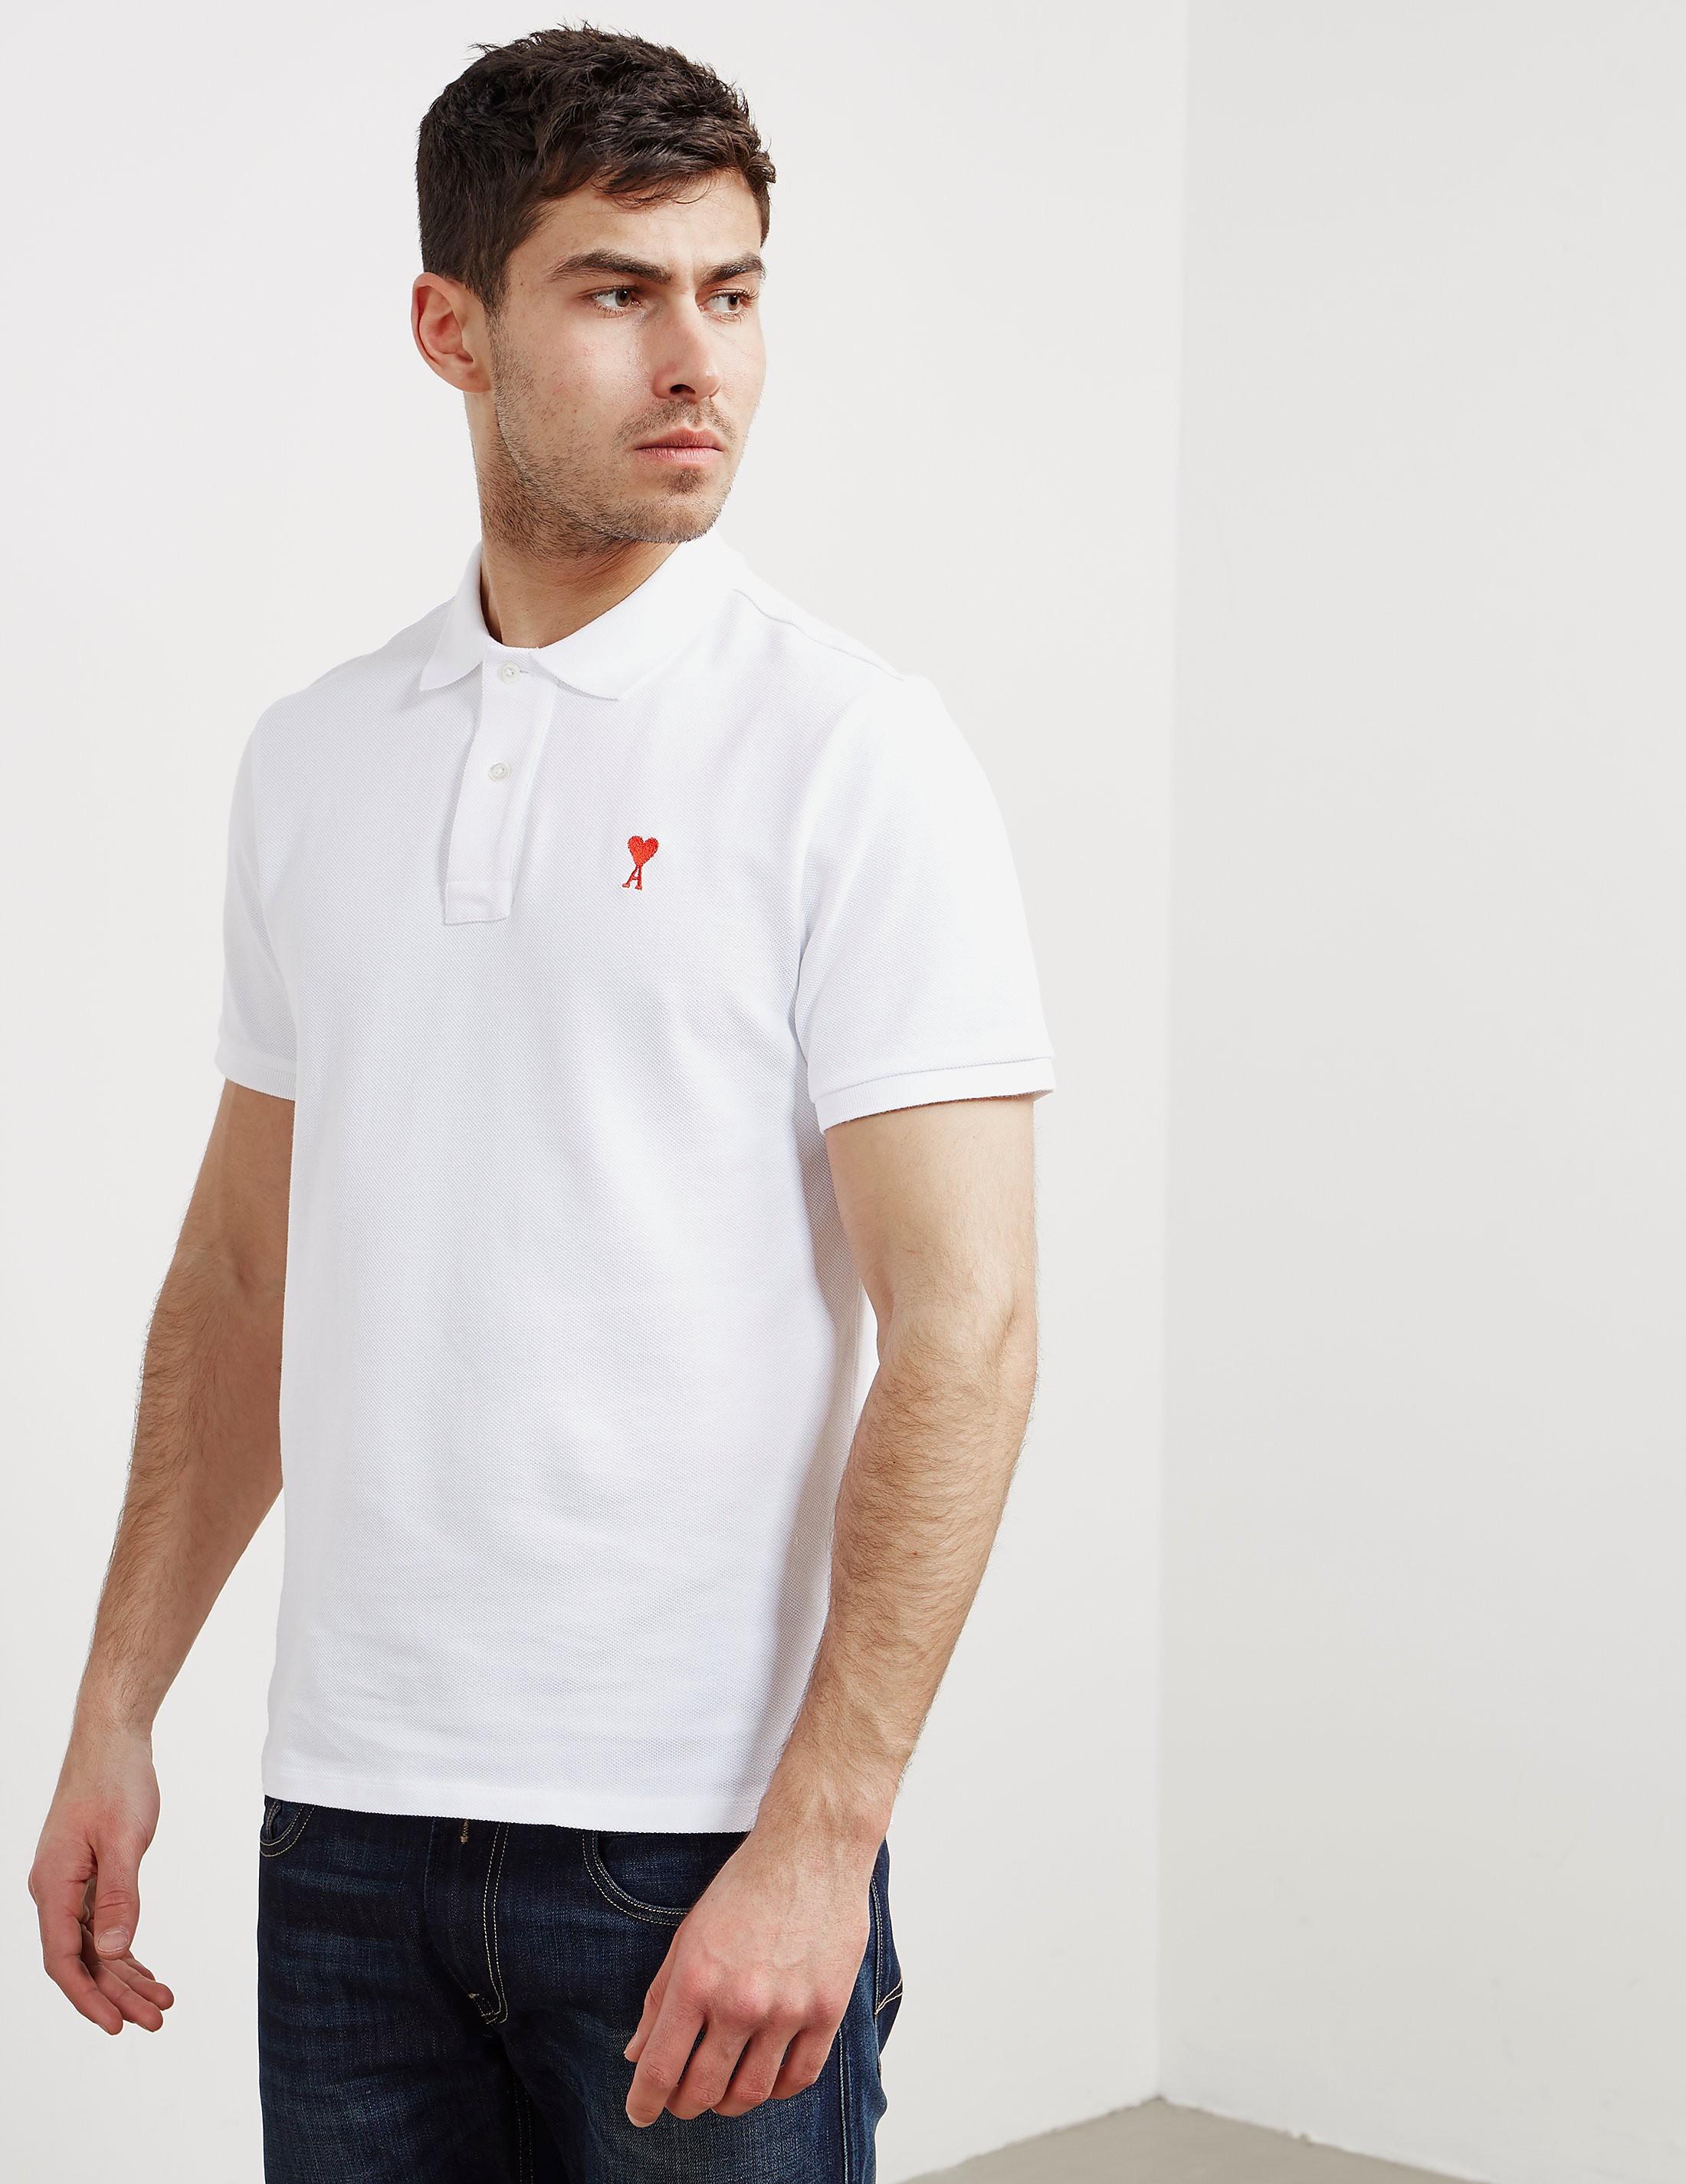 AMI Paris A Heart Short Sleeve Polo Shirt